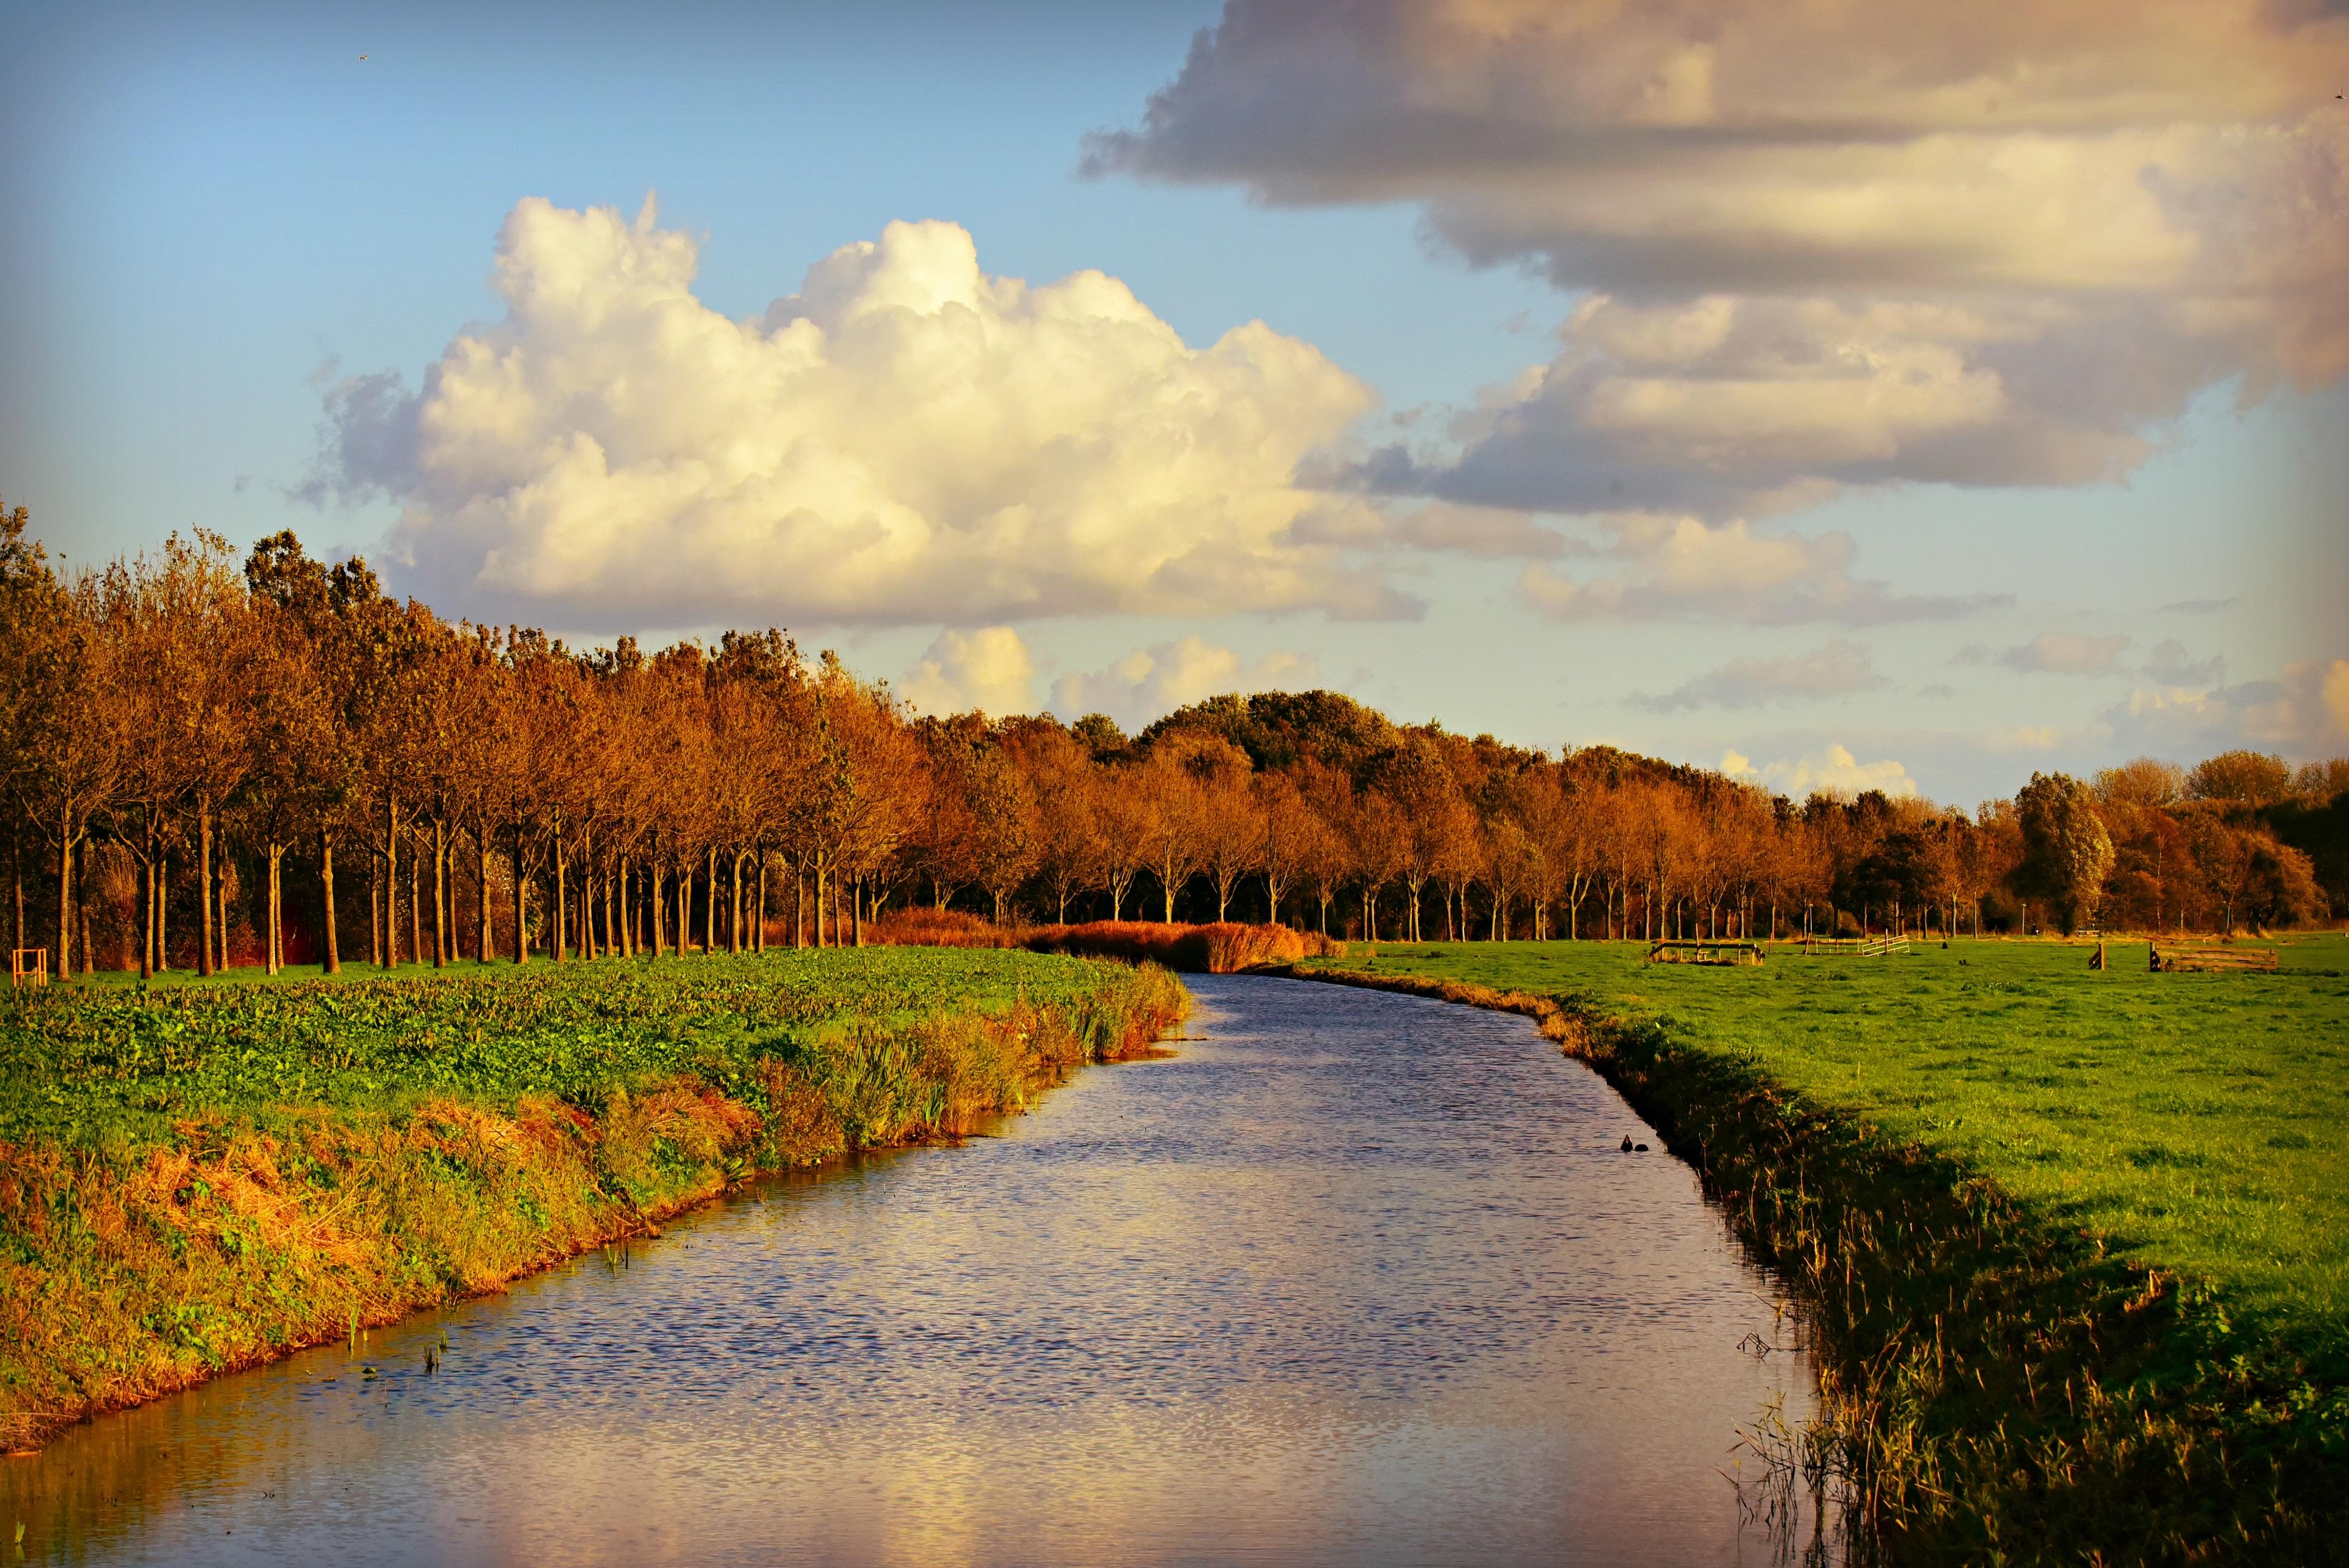 canal, waterway, 4k, hd, widescreen, wallpaper